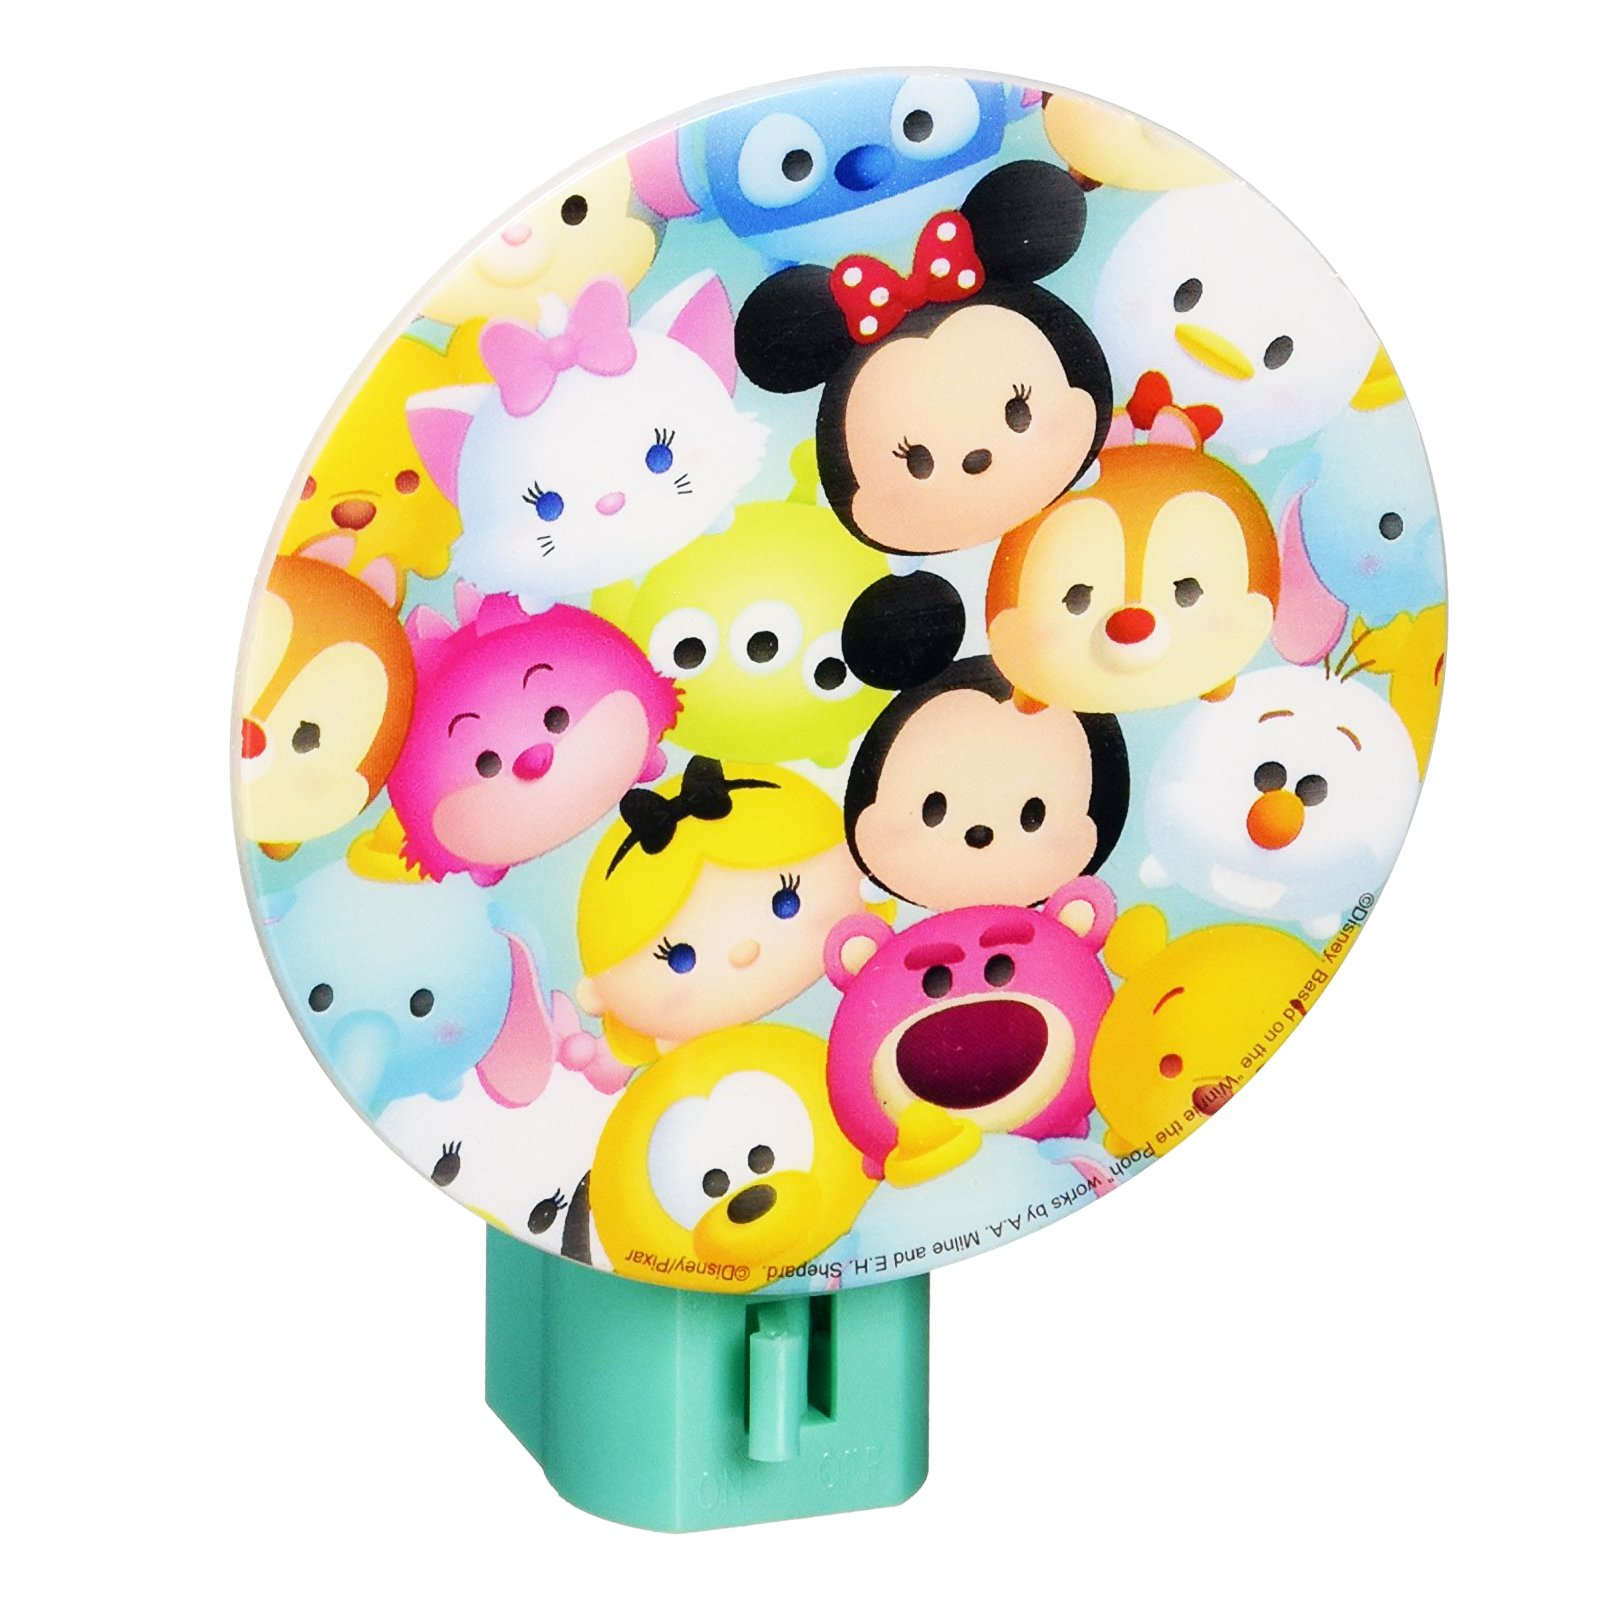 Disney Tsum Tsum Night Light Kids Bedroom Home Decor Minnie Mickey (3 Styles)